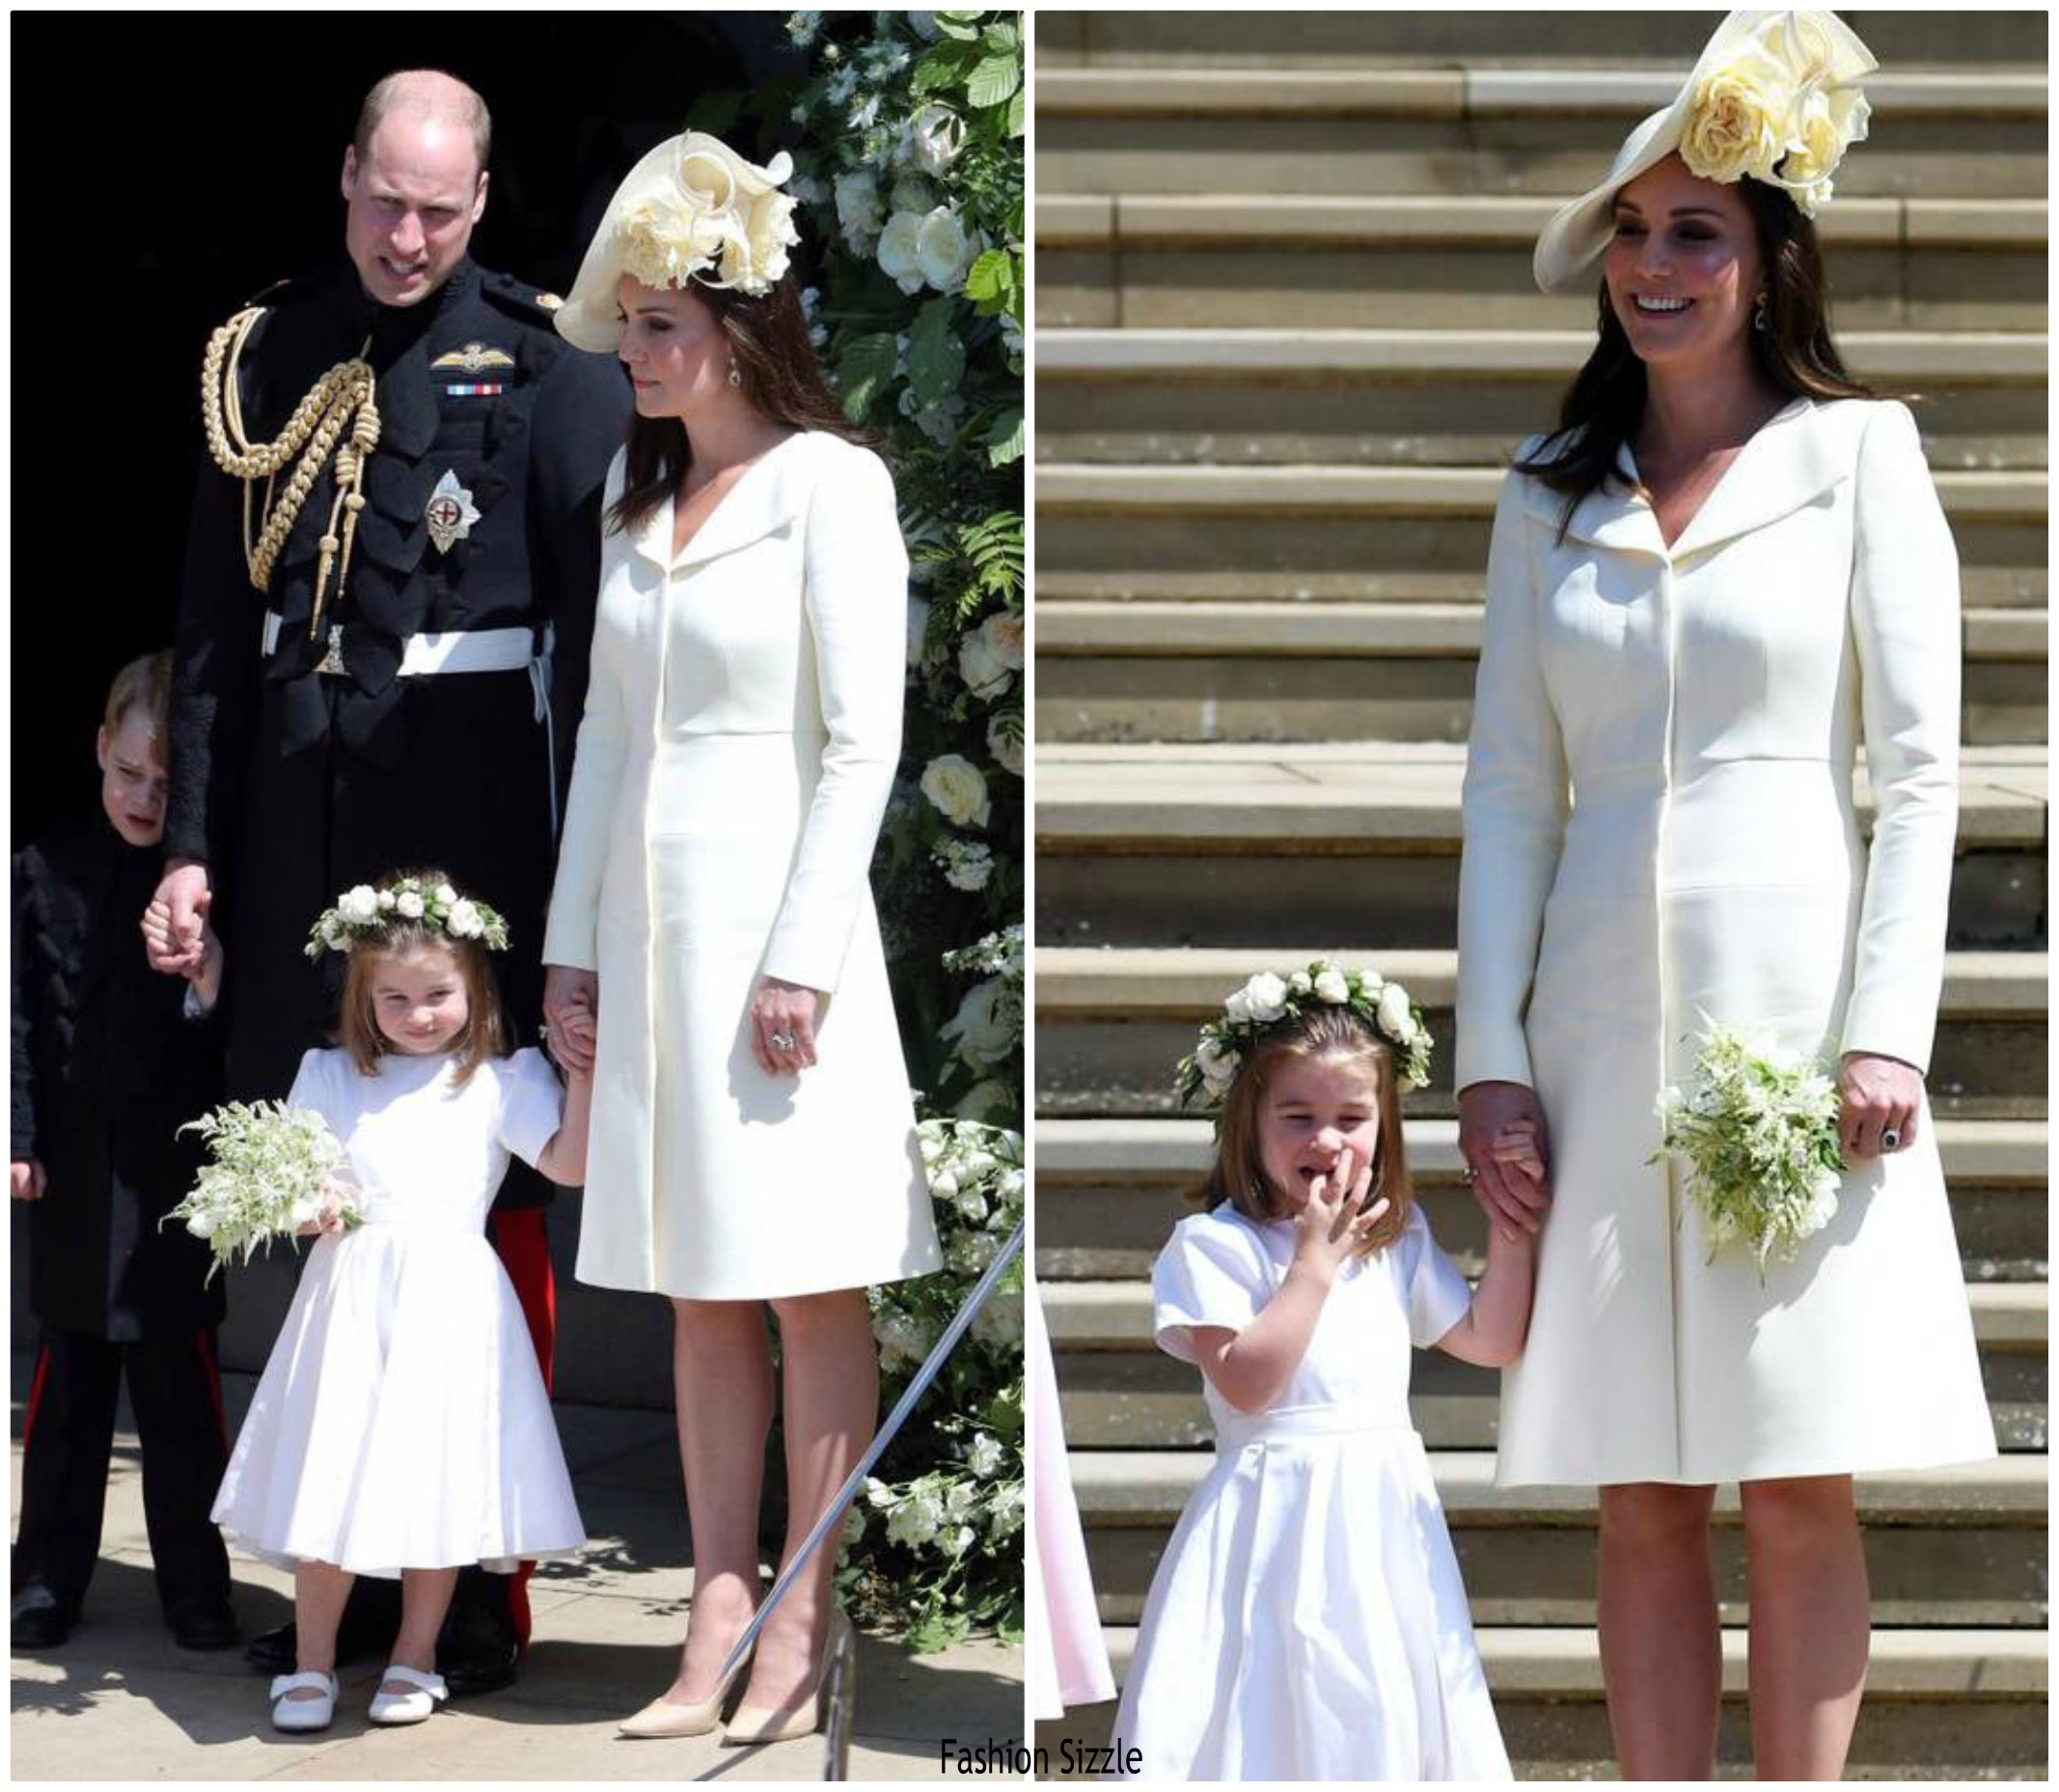 catherine-duchess-of-cambridge-in-alexander-mcqueen-prince-harry-meghan-markles-royal-wedding